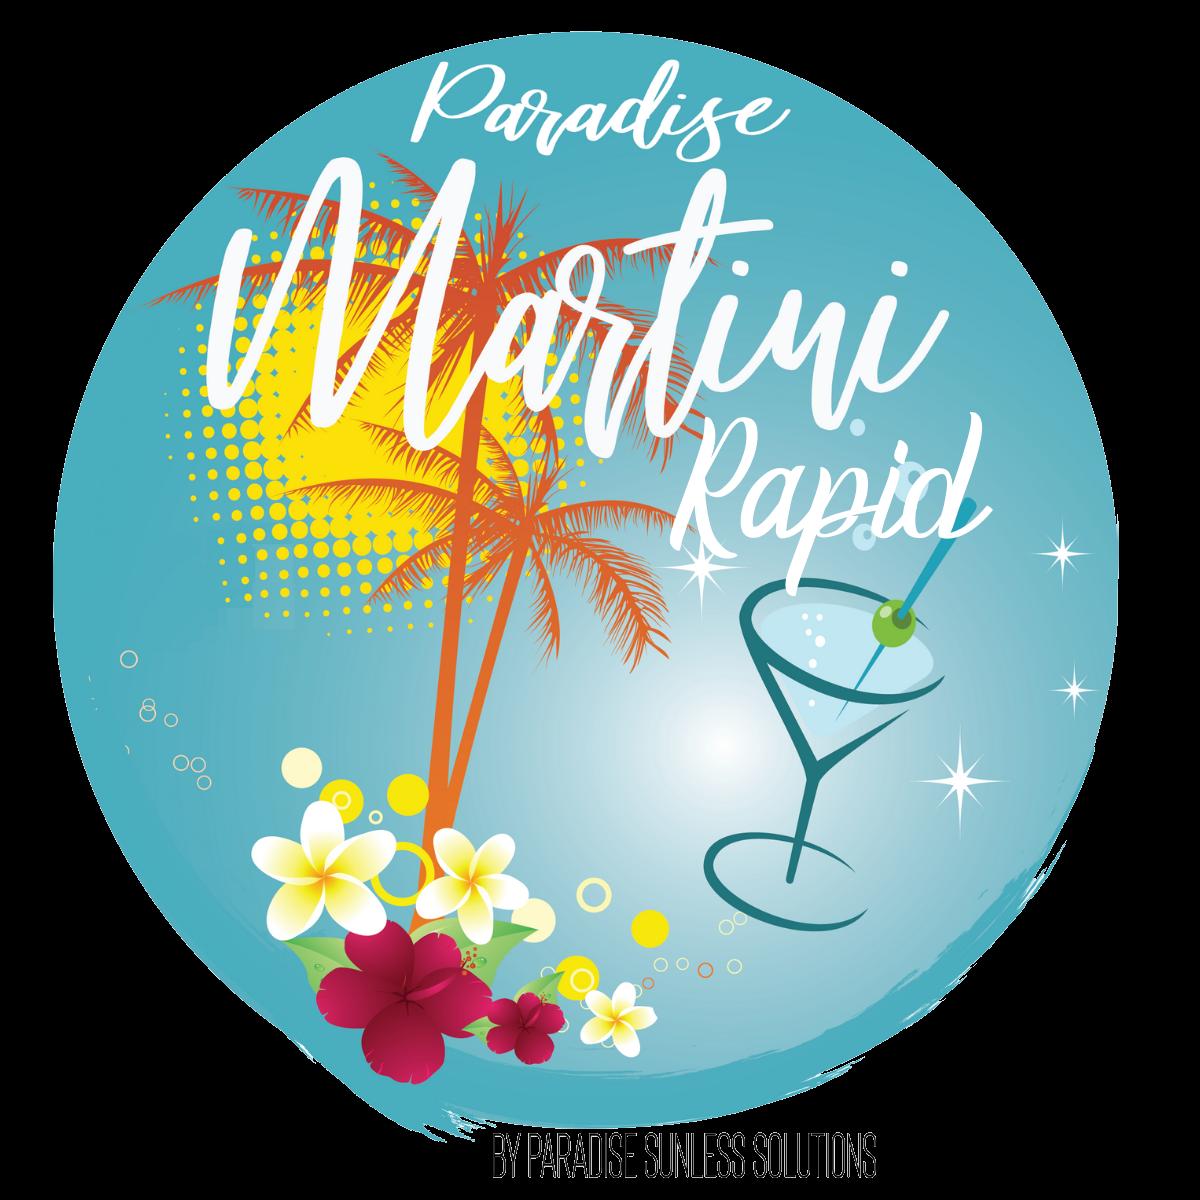 Paradise Martini Rapid 32 oz